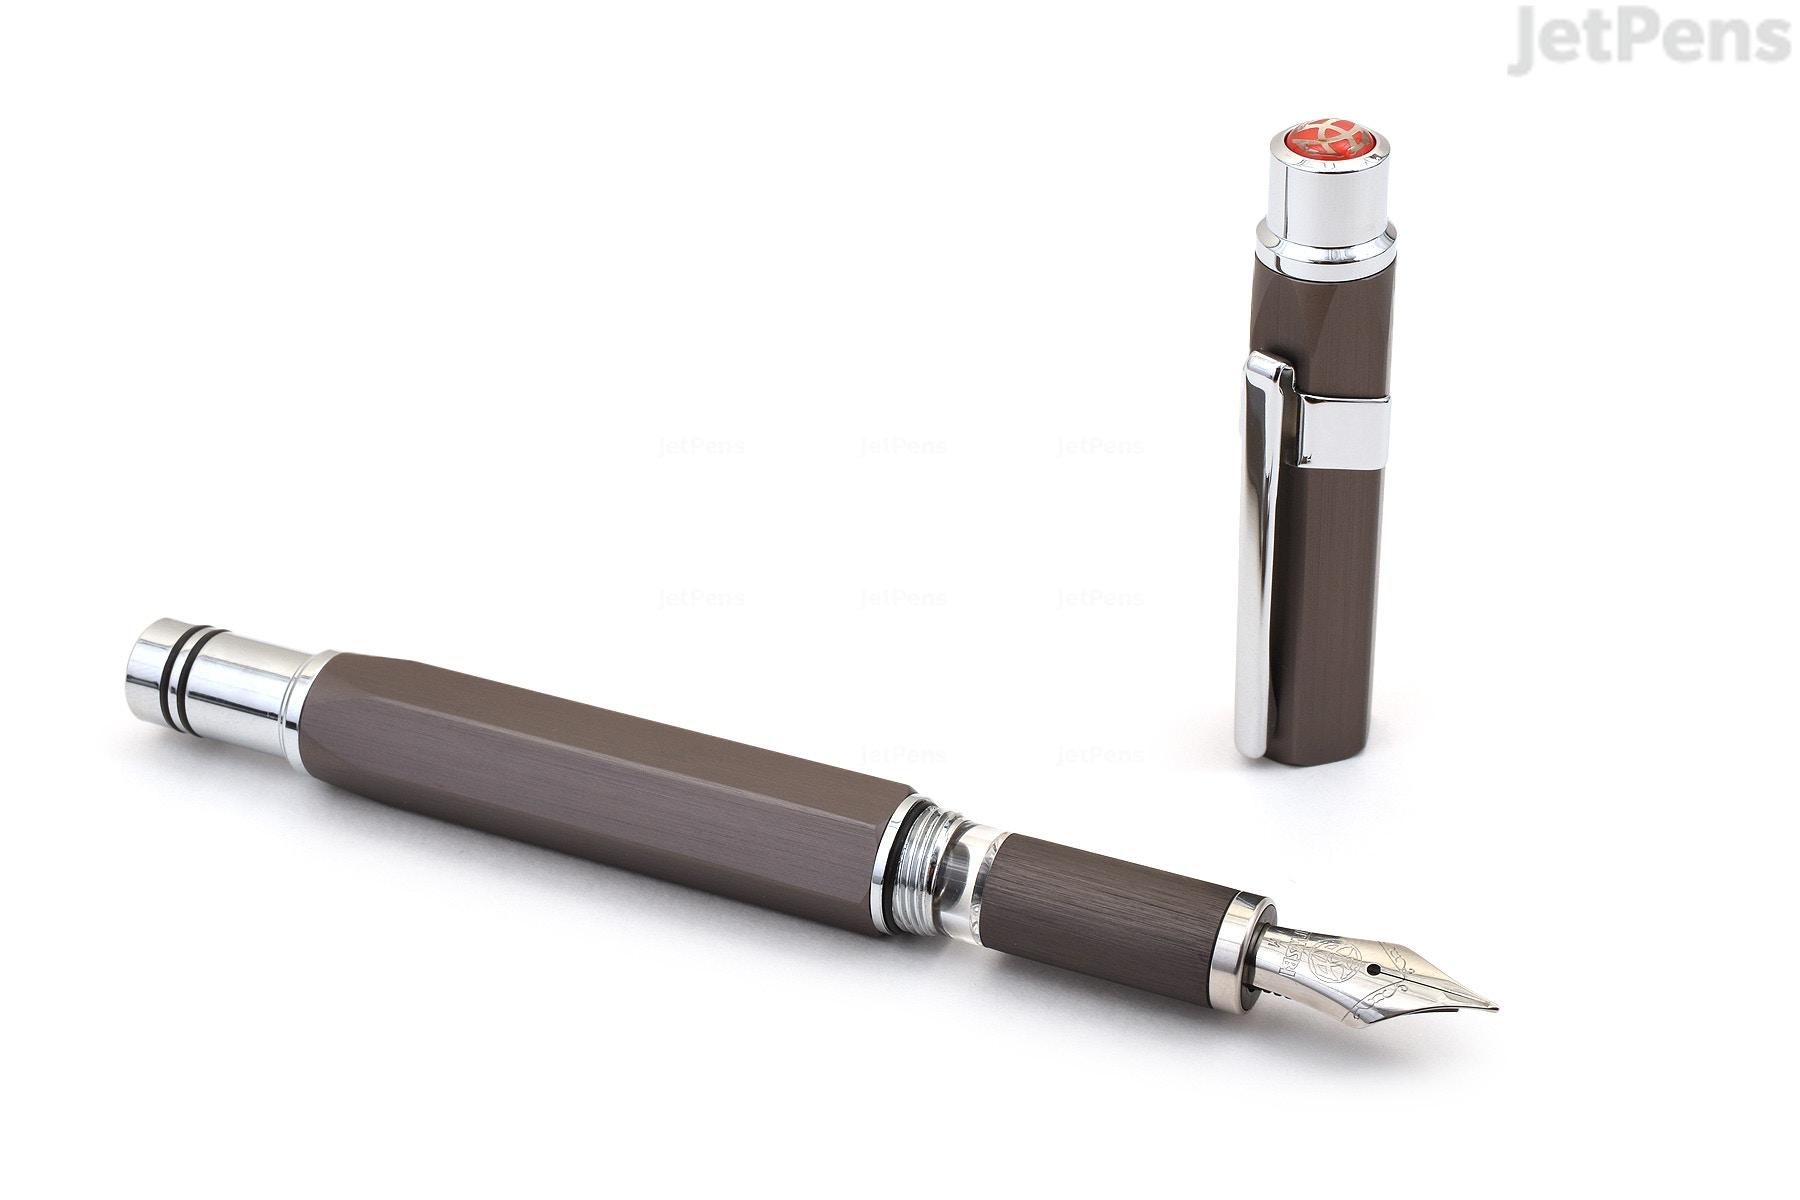 Twsbi Precision Fountain Pen Extra Fine Nib Parts Diagram